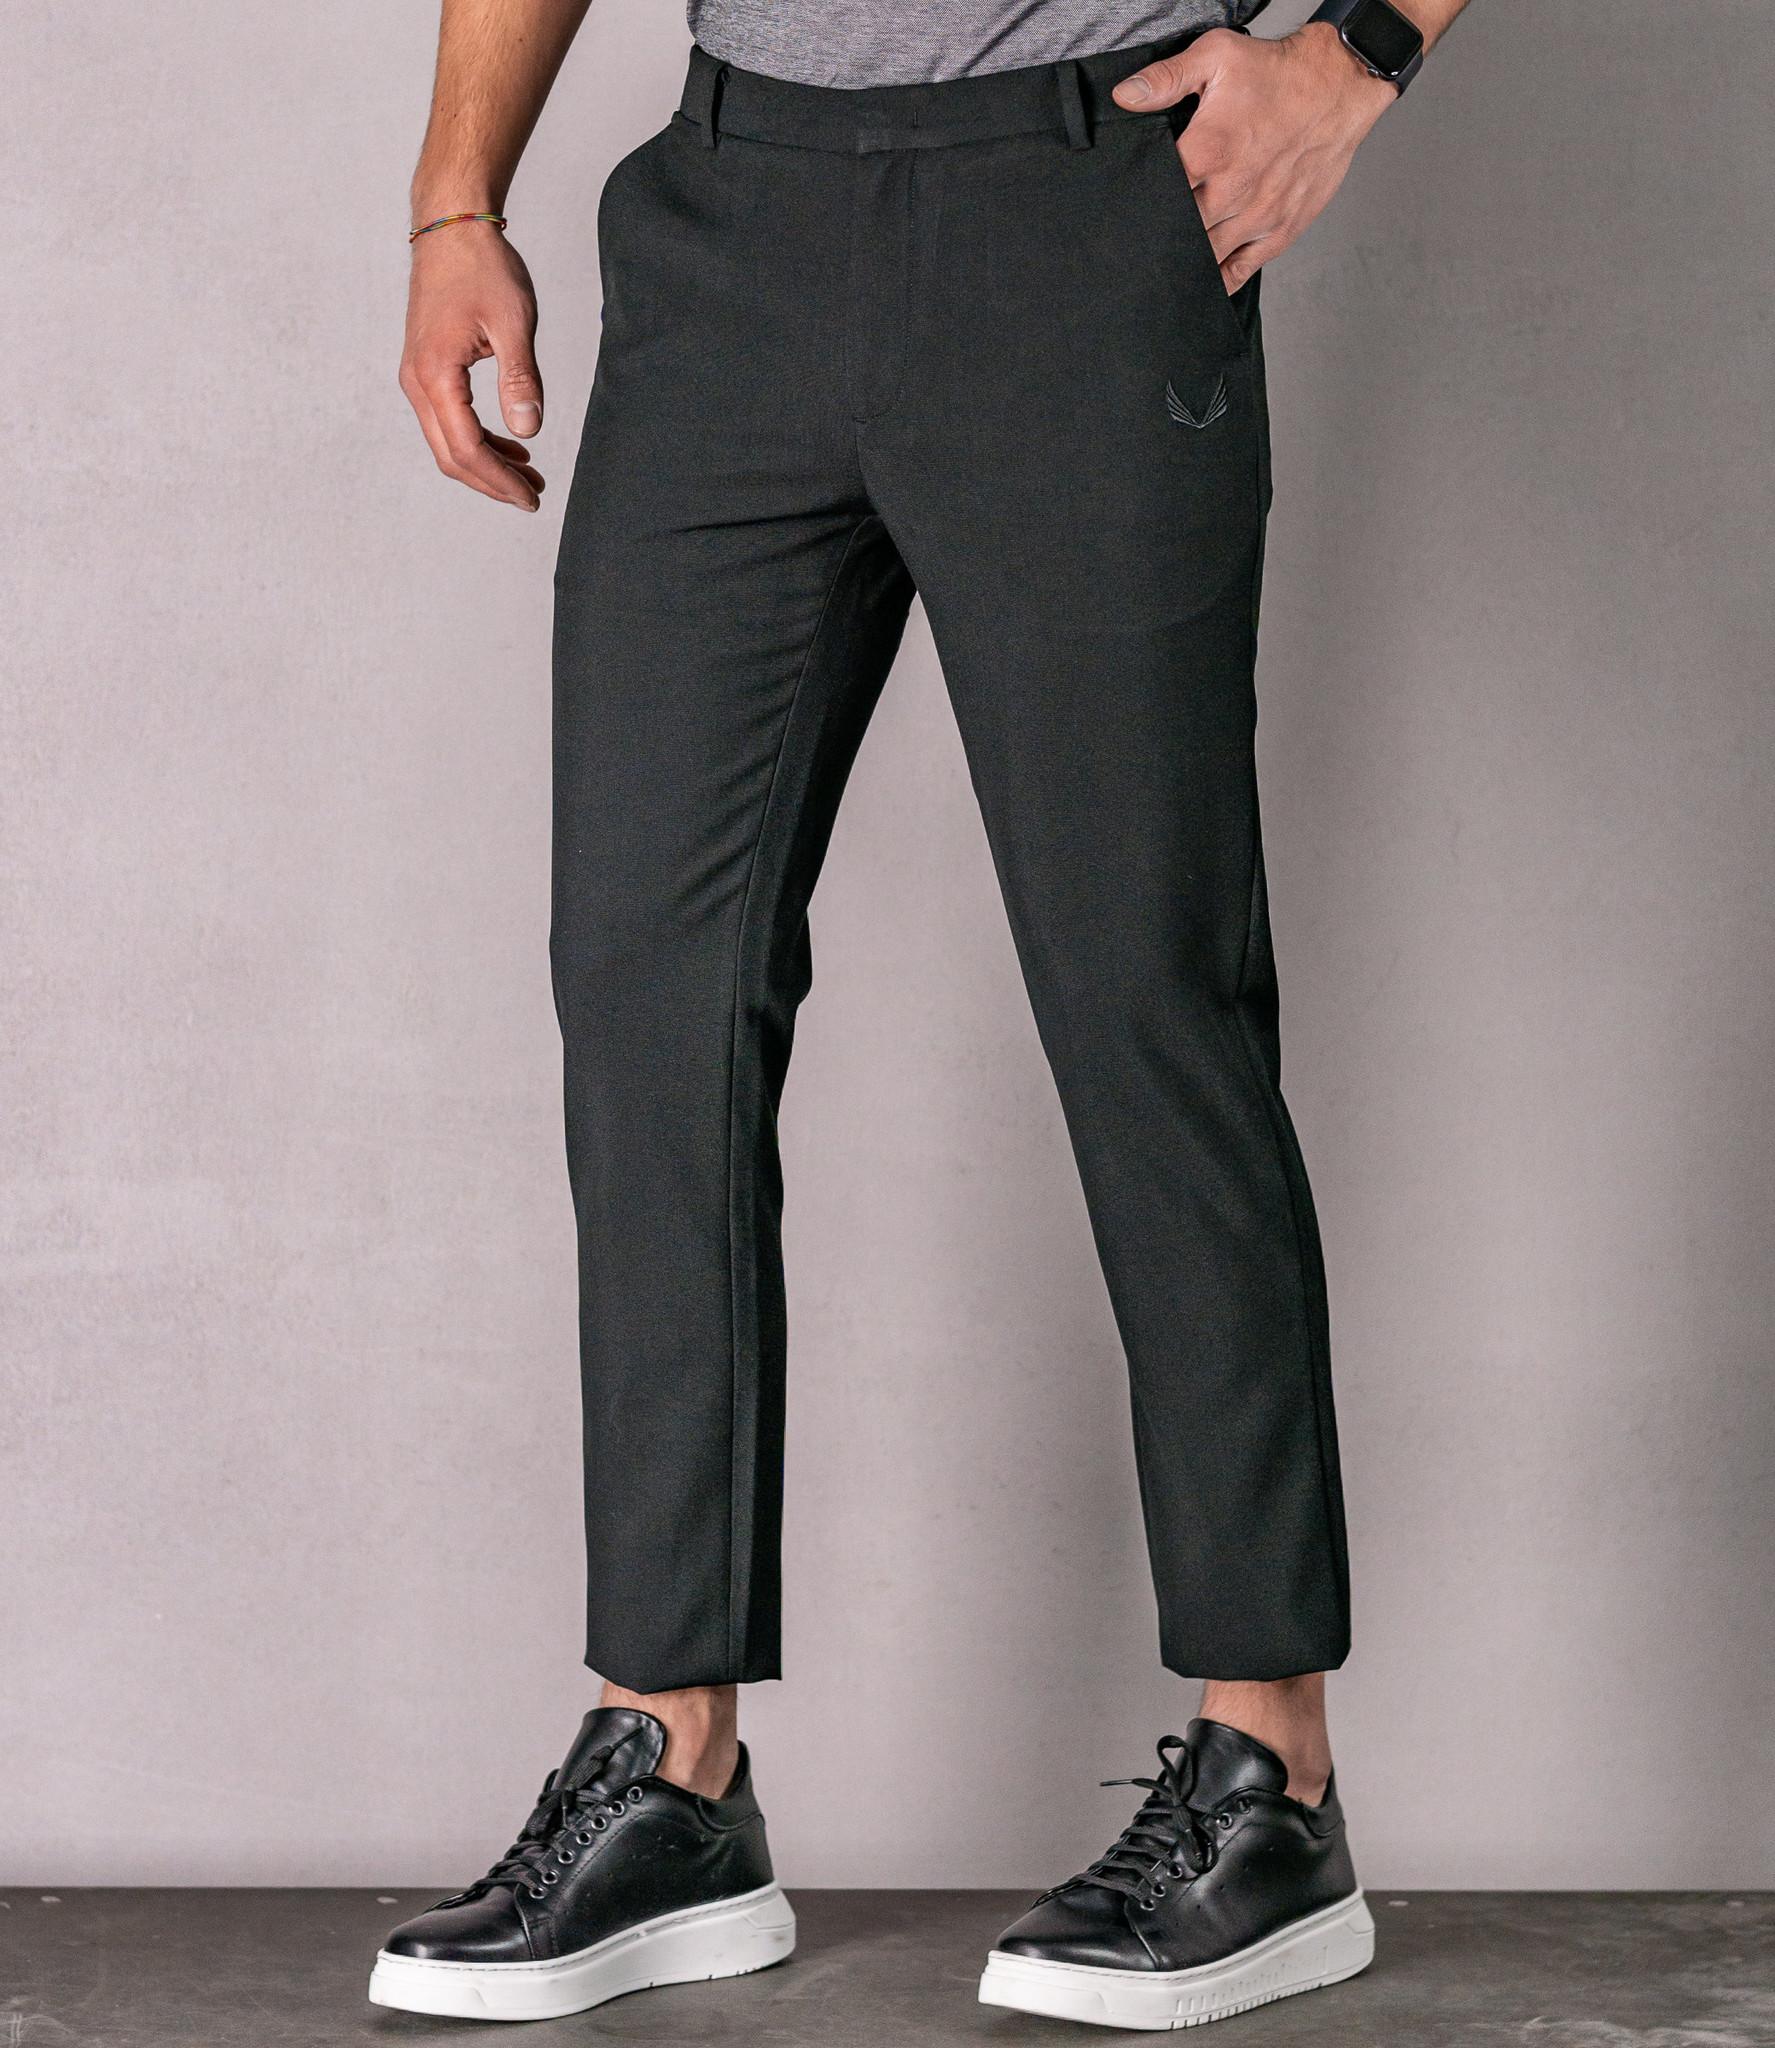 Zumo Slim Fit Pants BRIDGE-10 Black